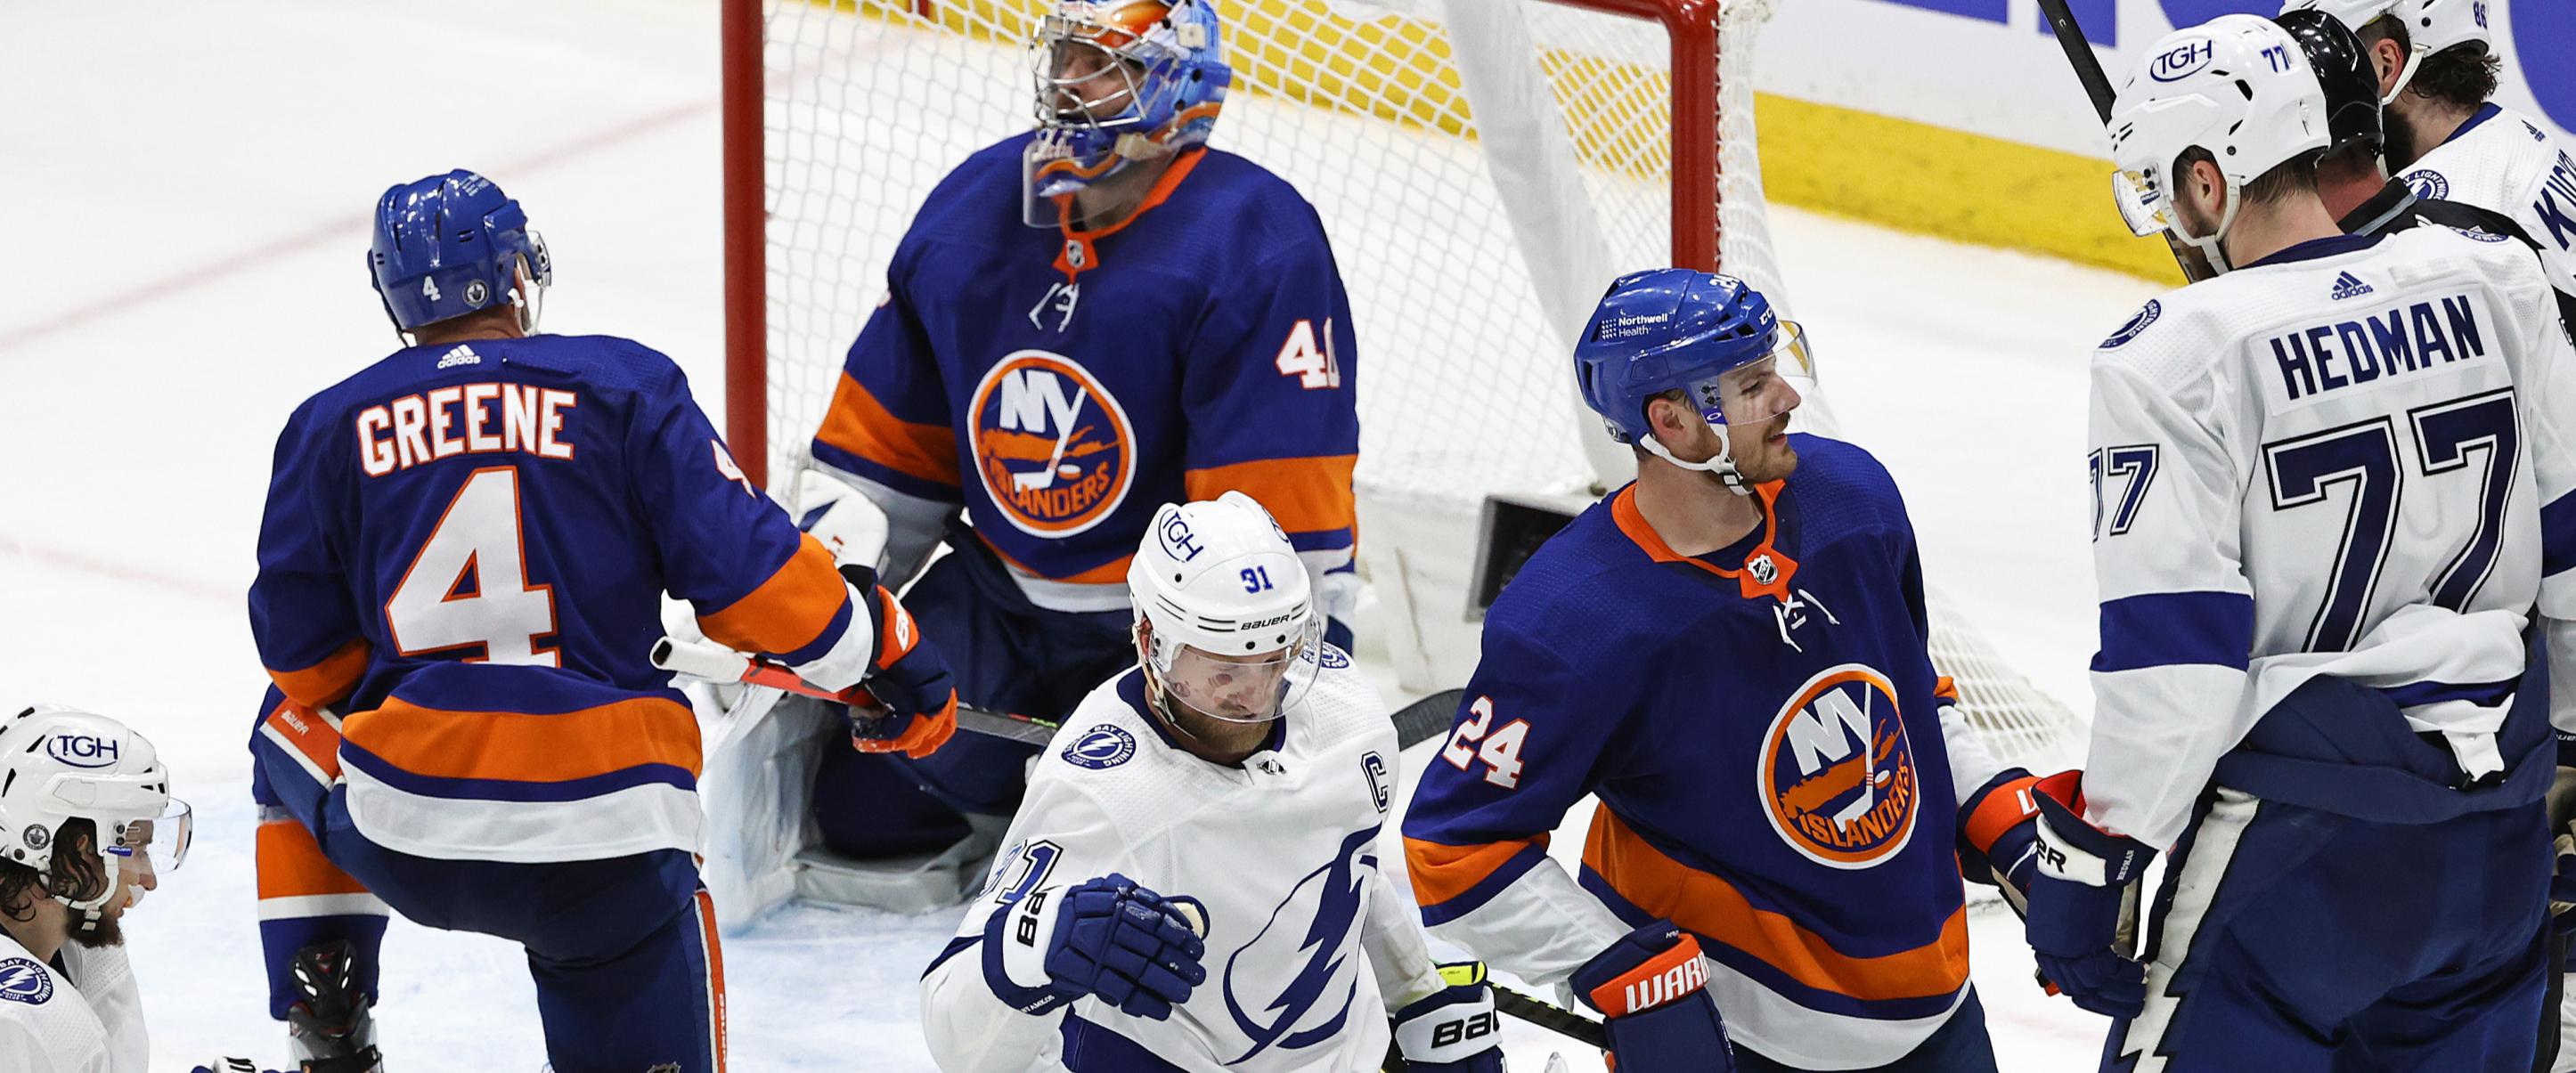 NY Islanders Head to Game 7